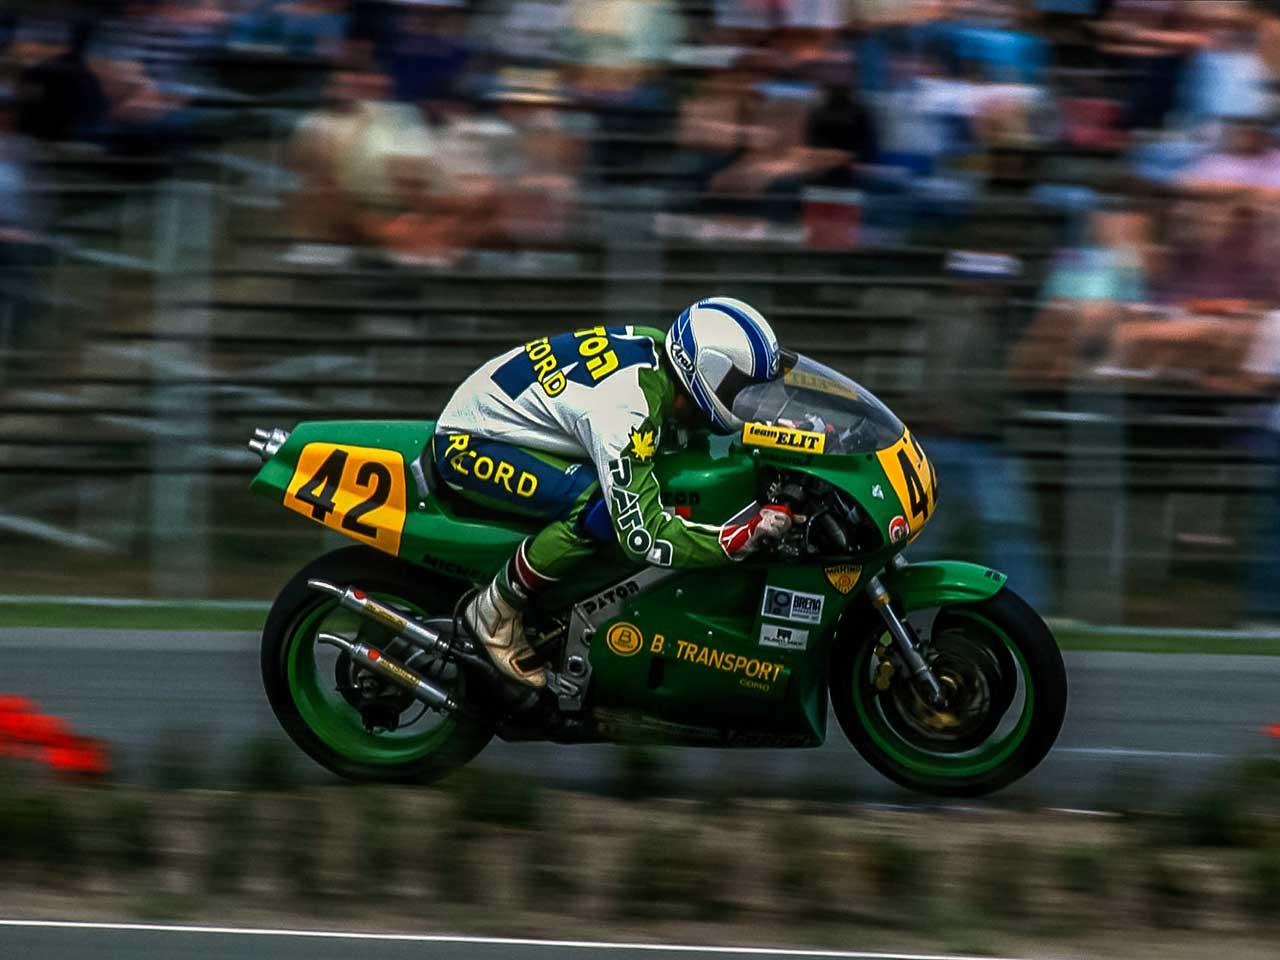 Paton_Storia-Anni90_Vittorio-Scatola_Assen_Campionato-Mondiale-500cc_1990